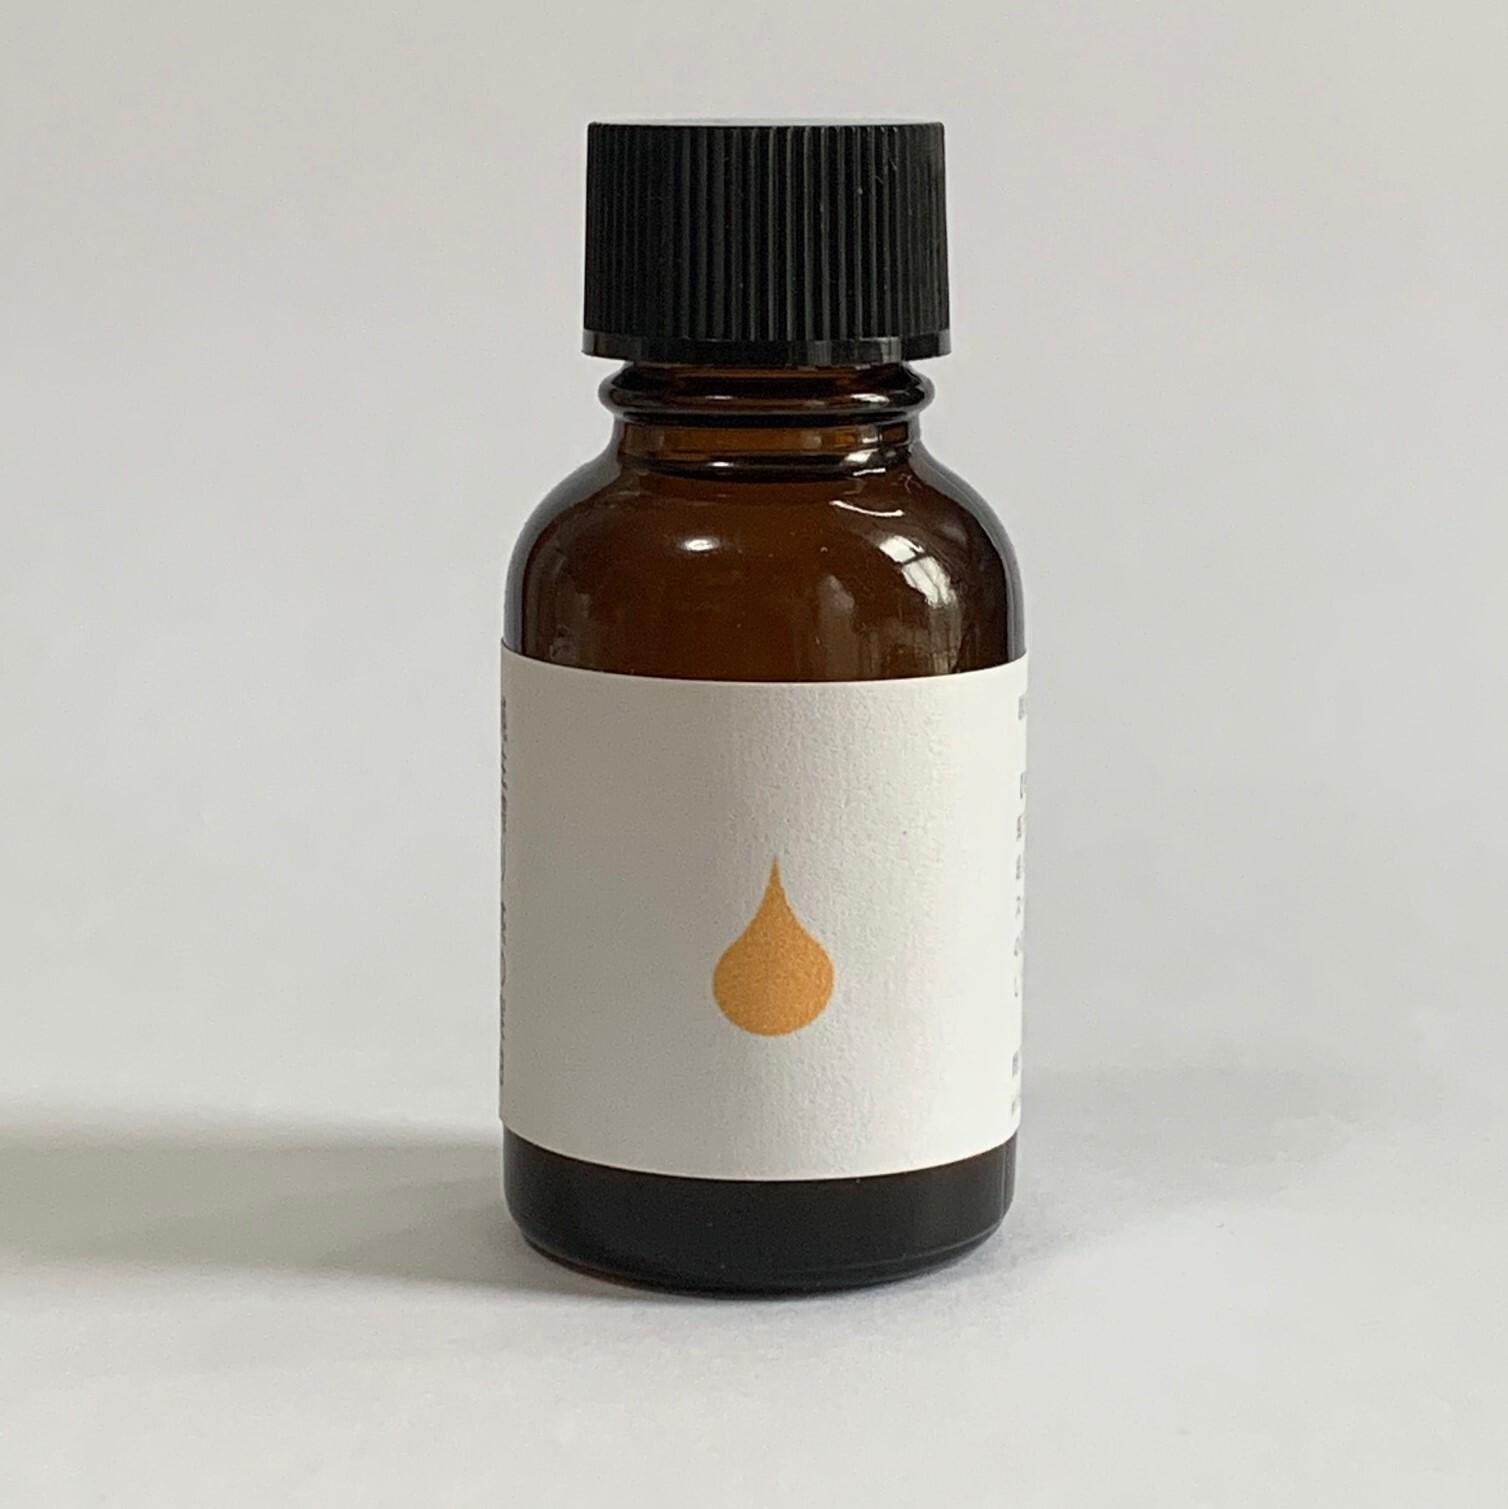 TEA OIL Selection 純生搾り 食用 茶の実油 20g